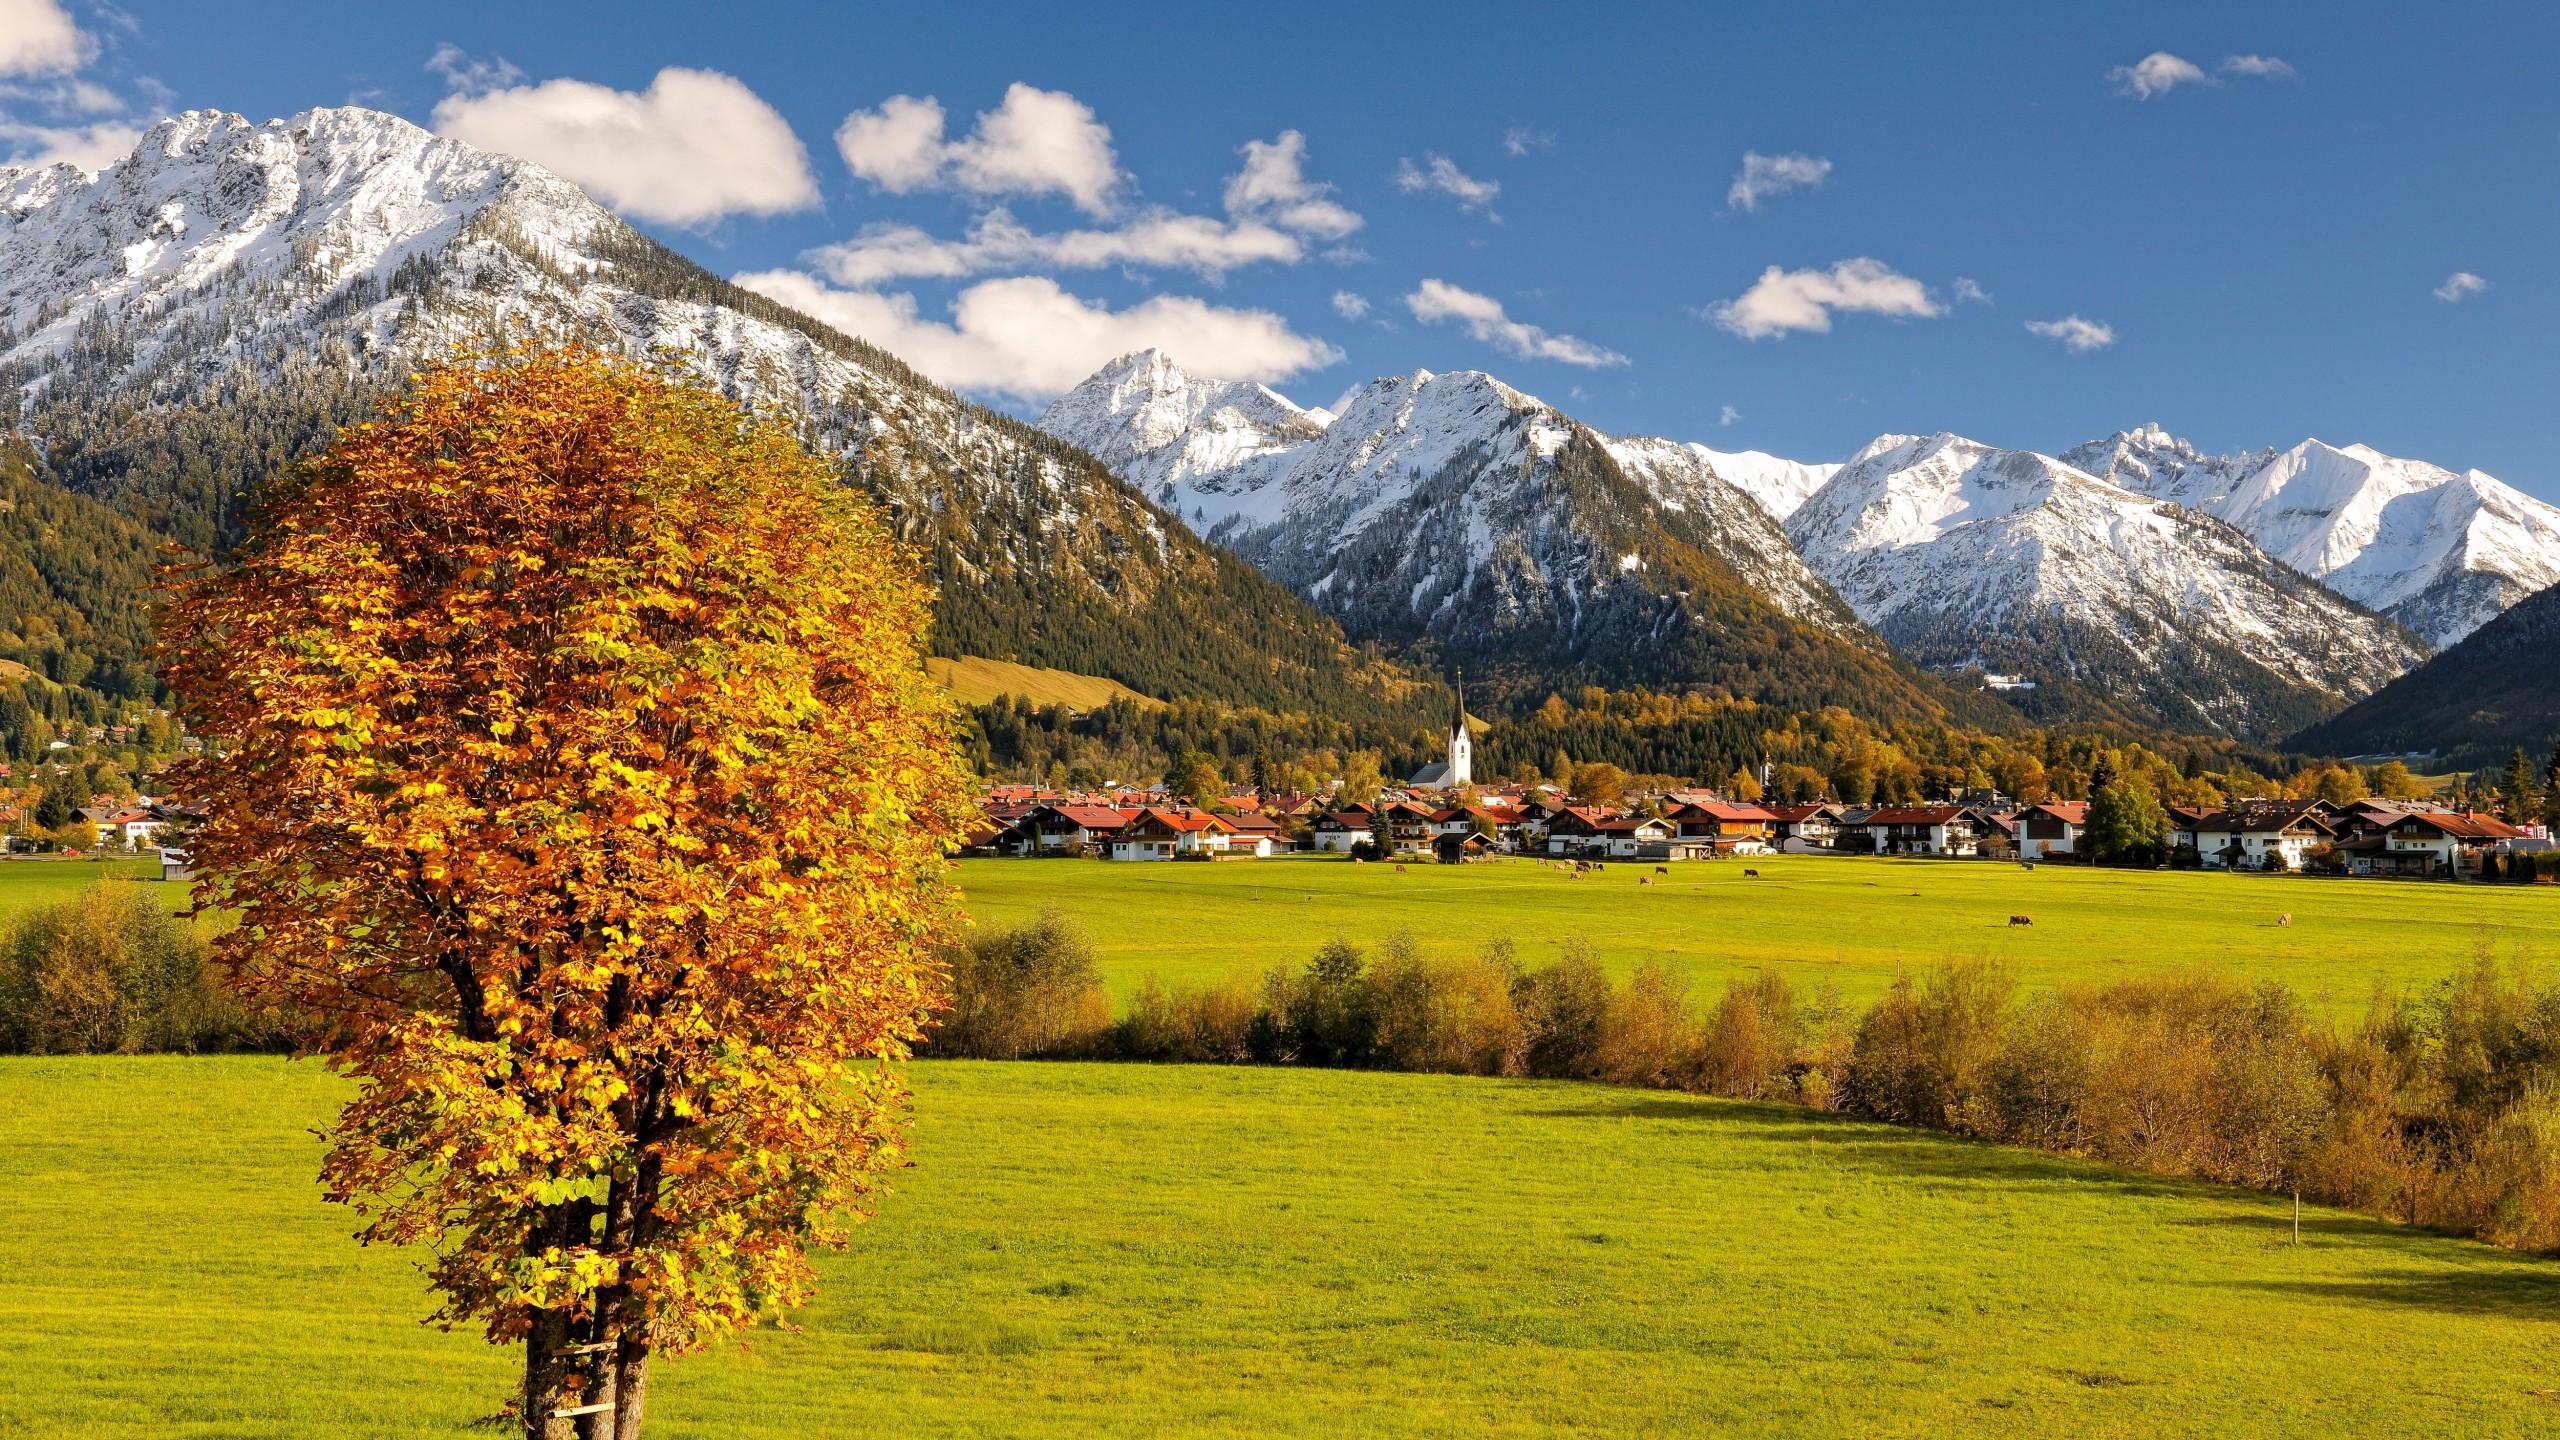 Fall Forest Wallpaper For Desktop Wallpaper Allgaeu Germany Europe Mountains Autumn